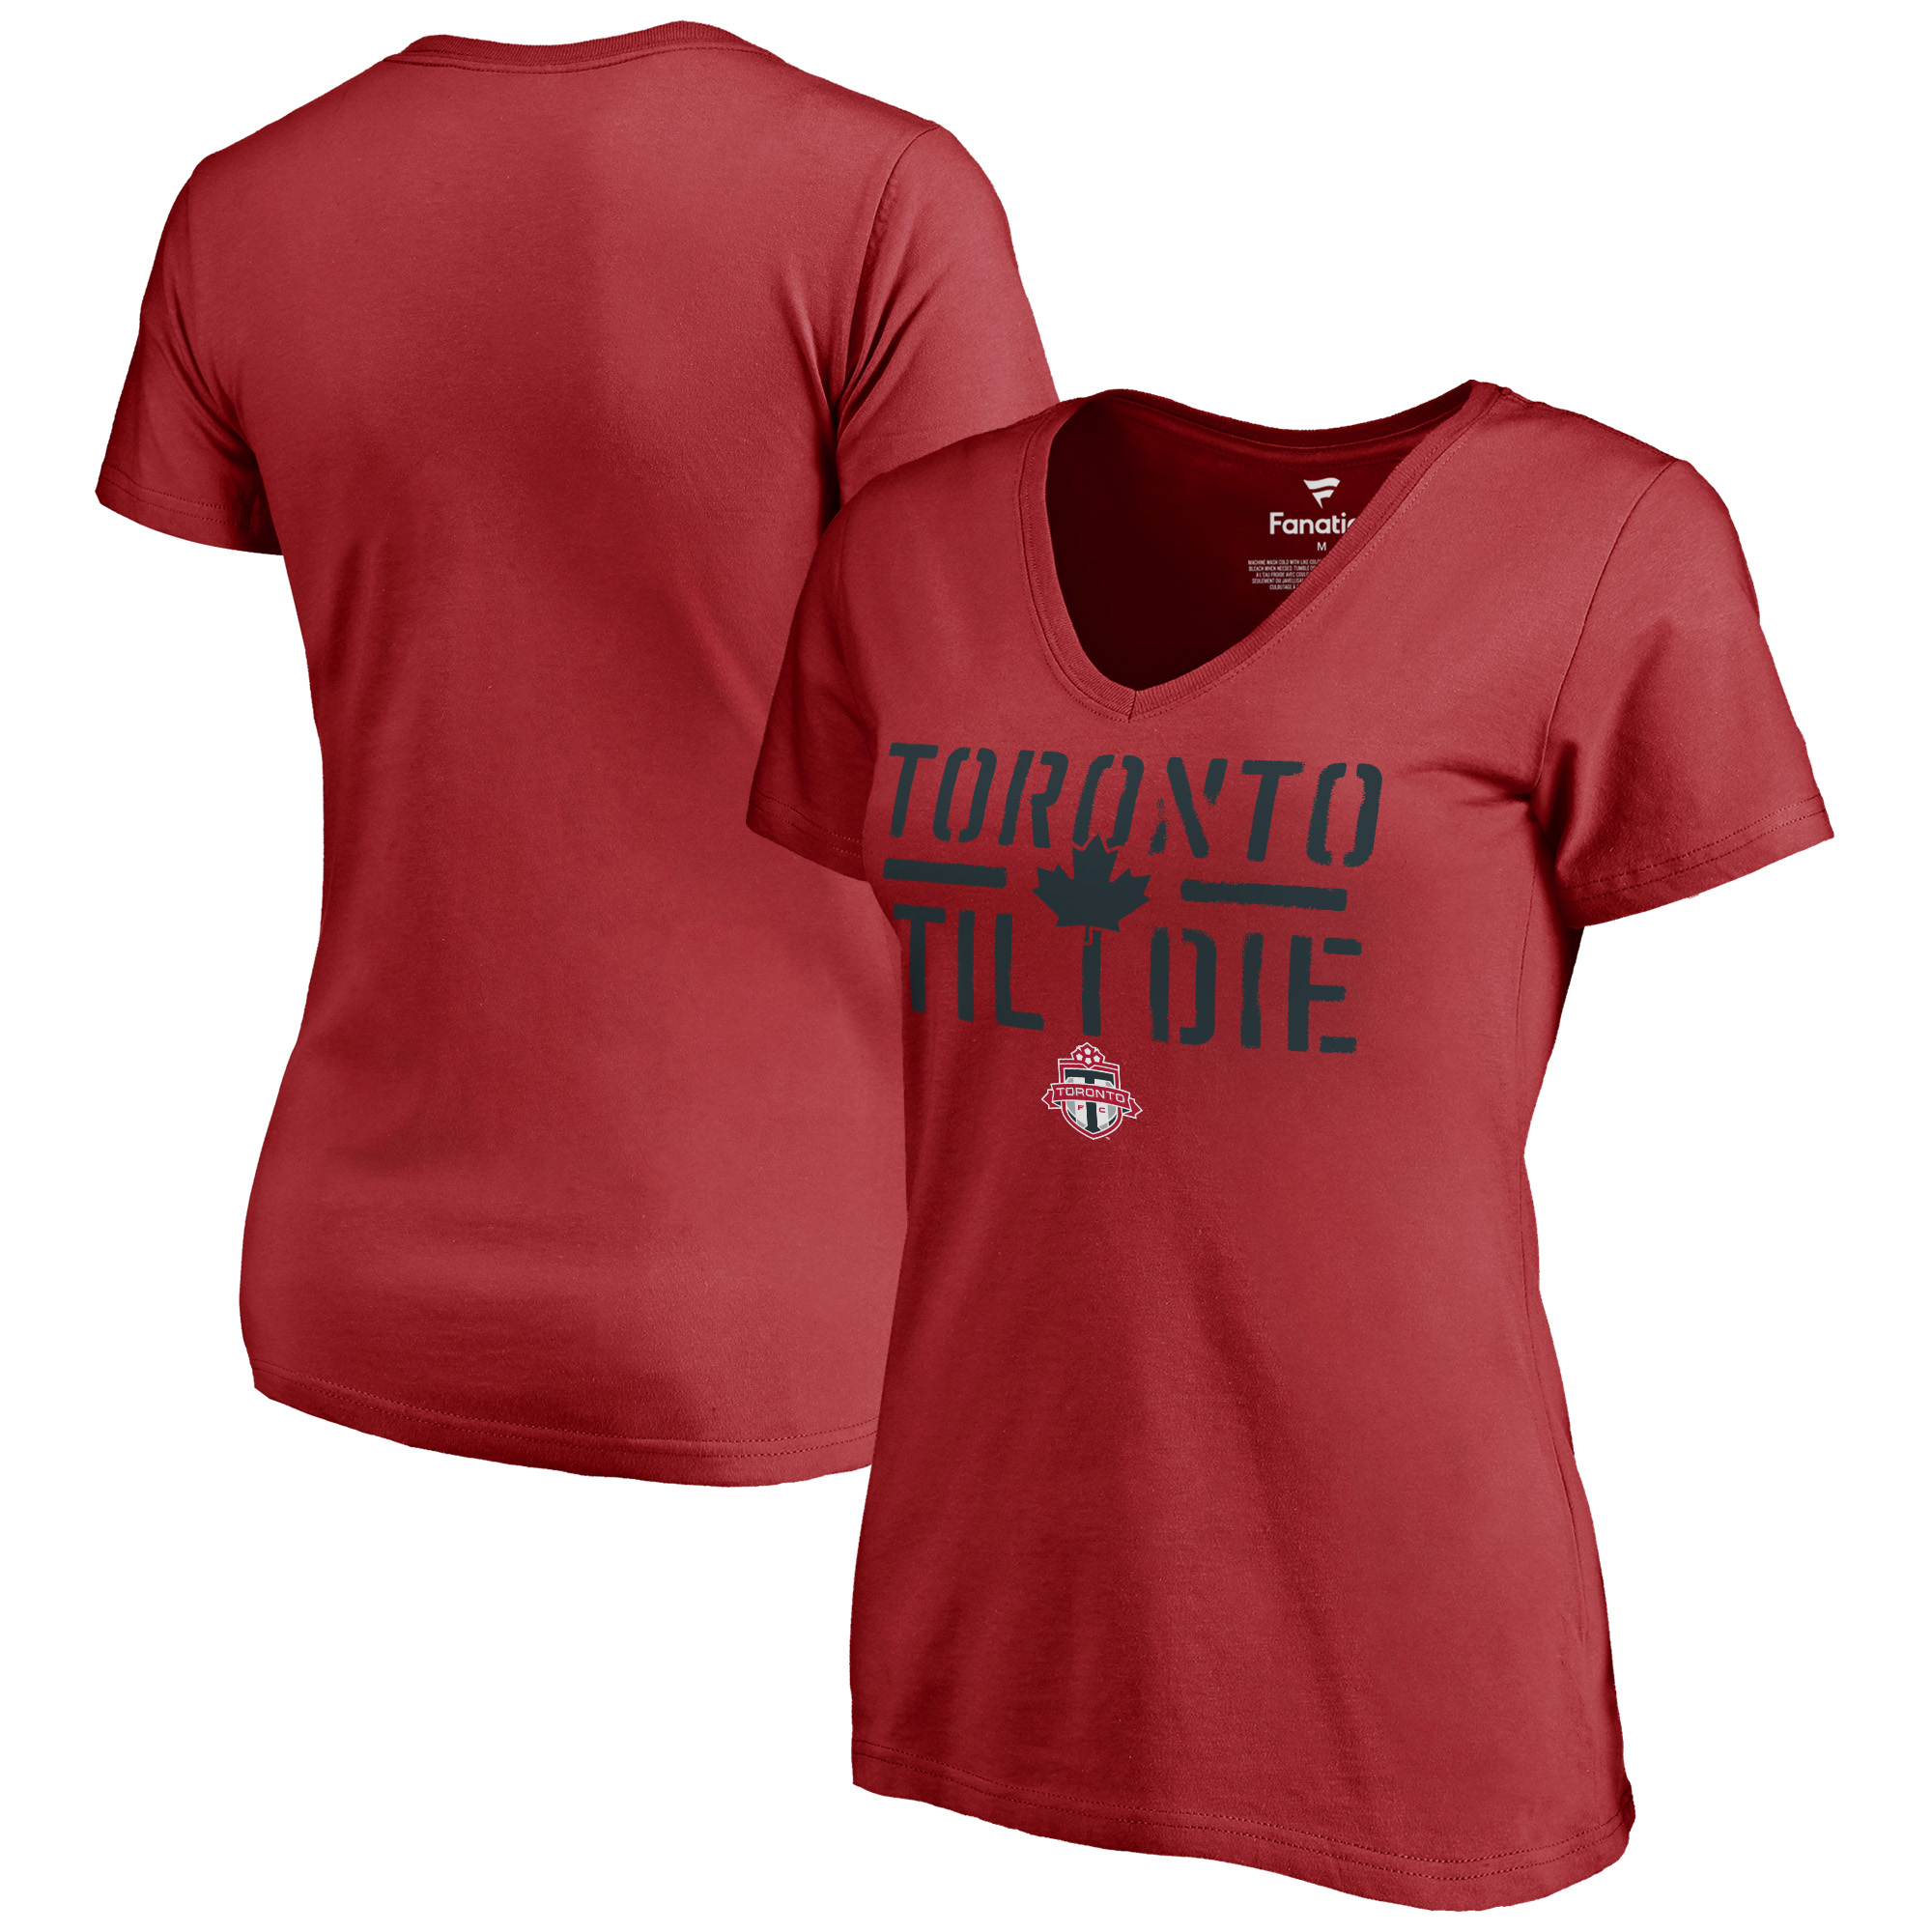 Toronto FC Fanatics Branded Women's Hometown Collection Til I Die V-Neck T-Shirt - Red